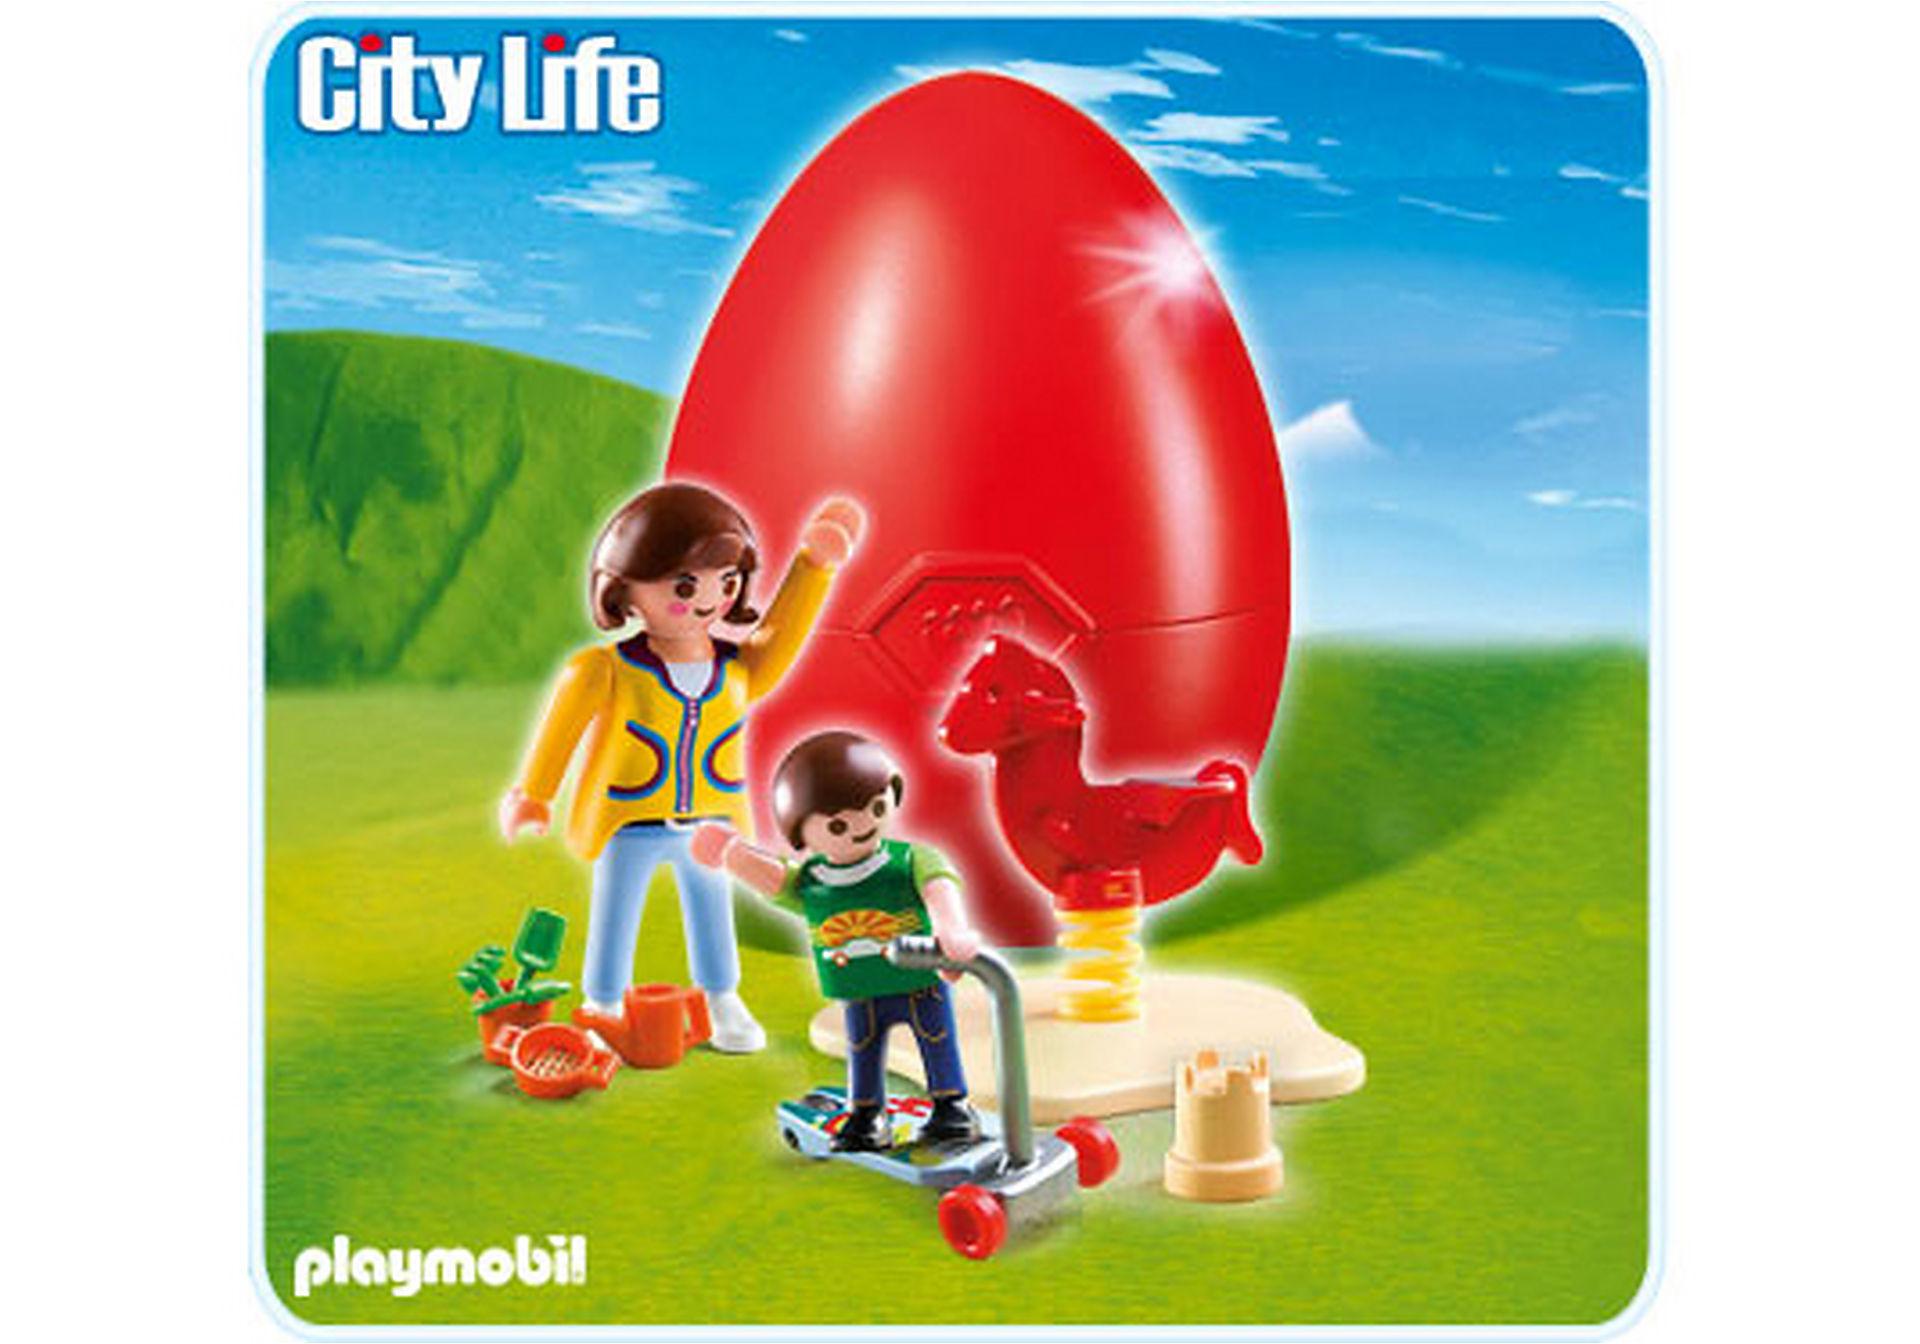 http://media.playmobil.com/i/playmobil/4939-A_product_detail/Auf dem Spielplatz